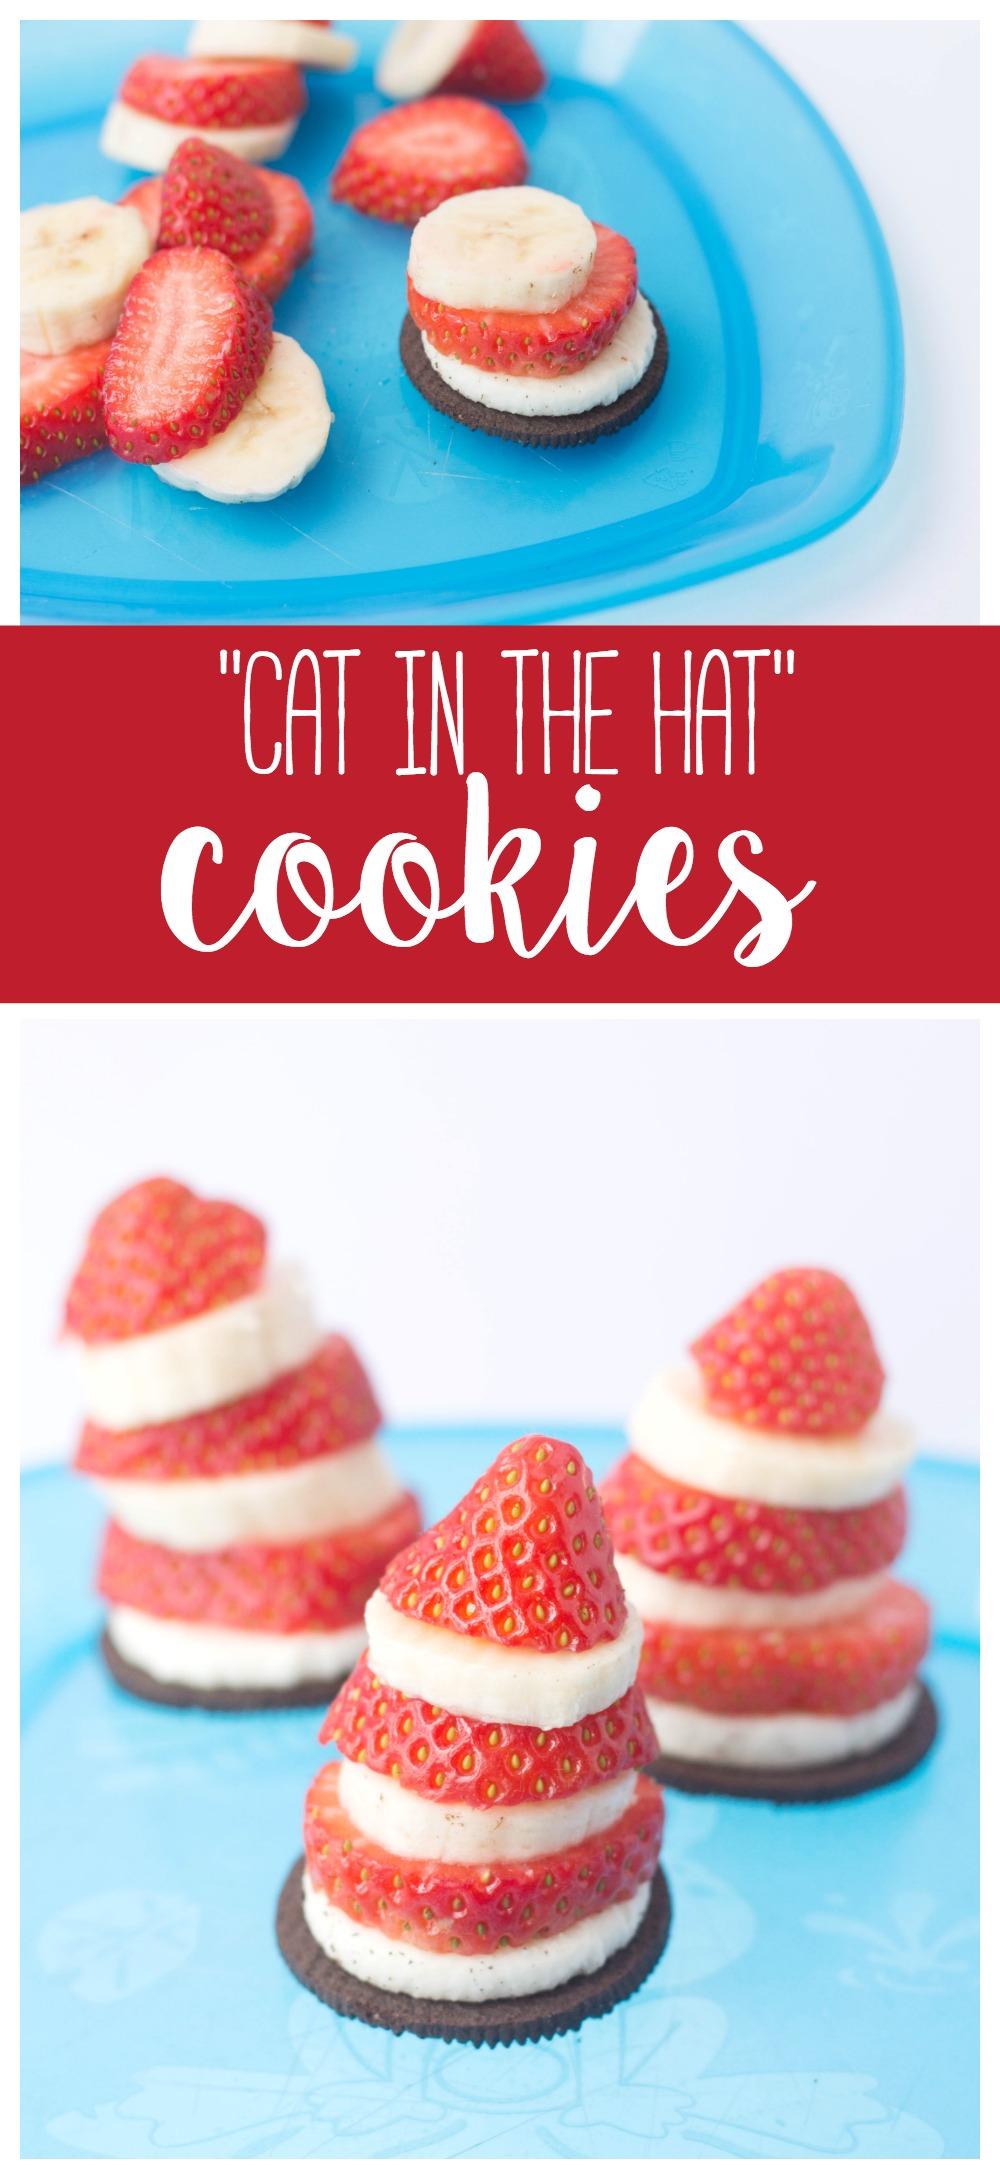 Cat in the Hat Cookies | Dr. Seuss | Kids Treat | Healthy Snack